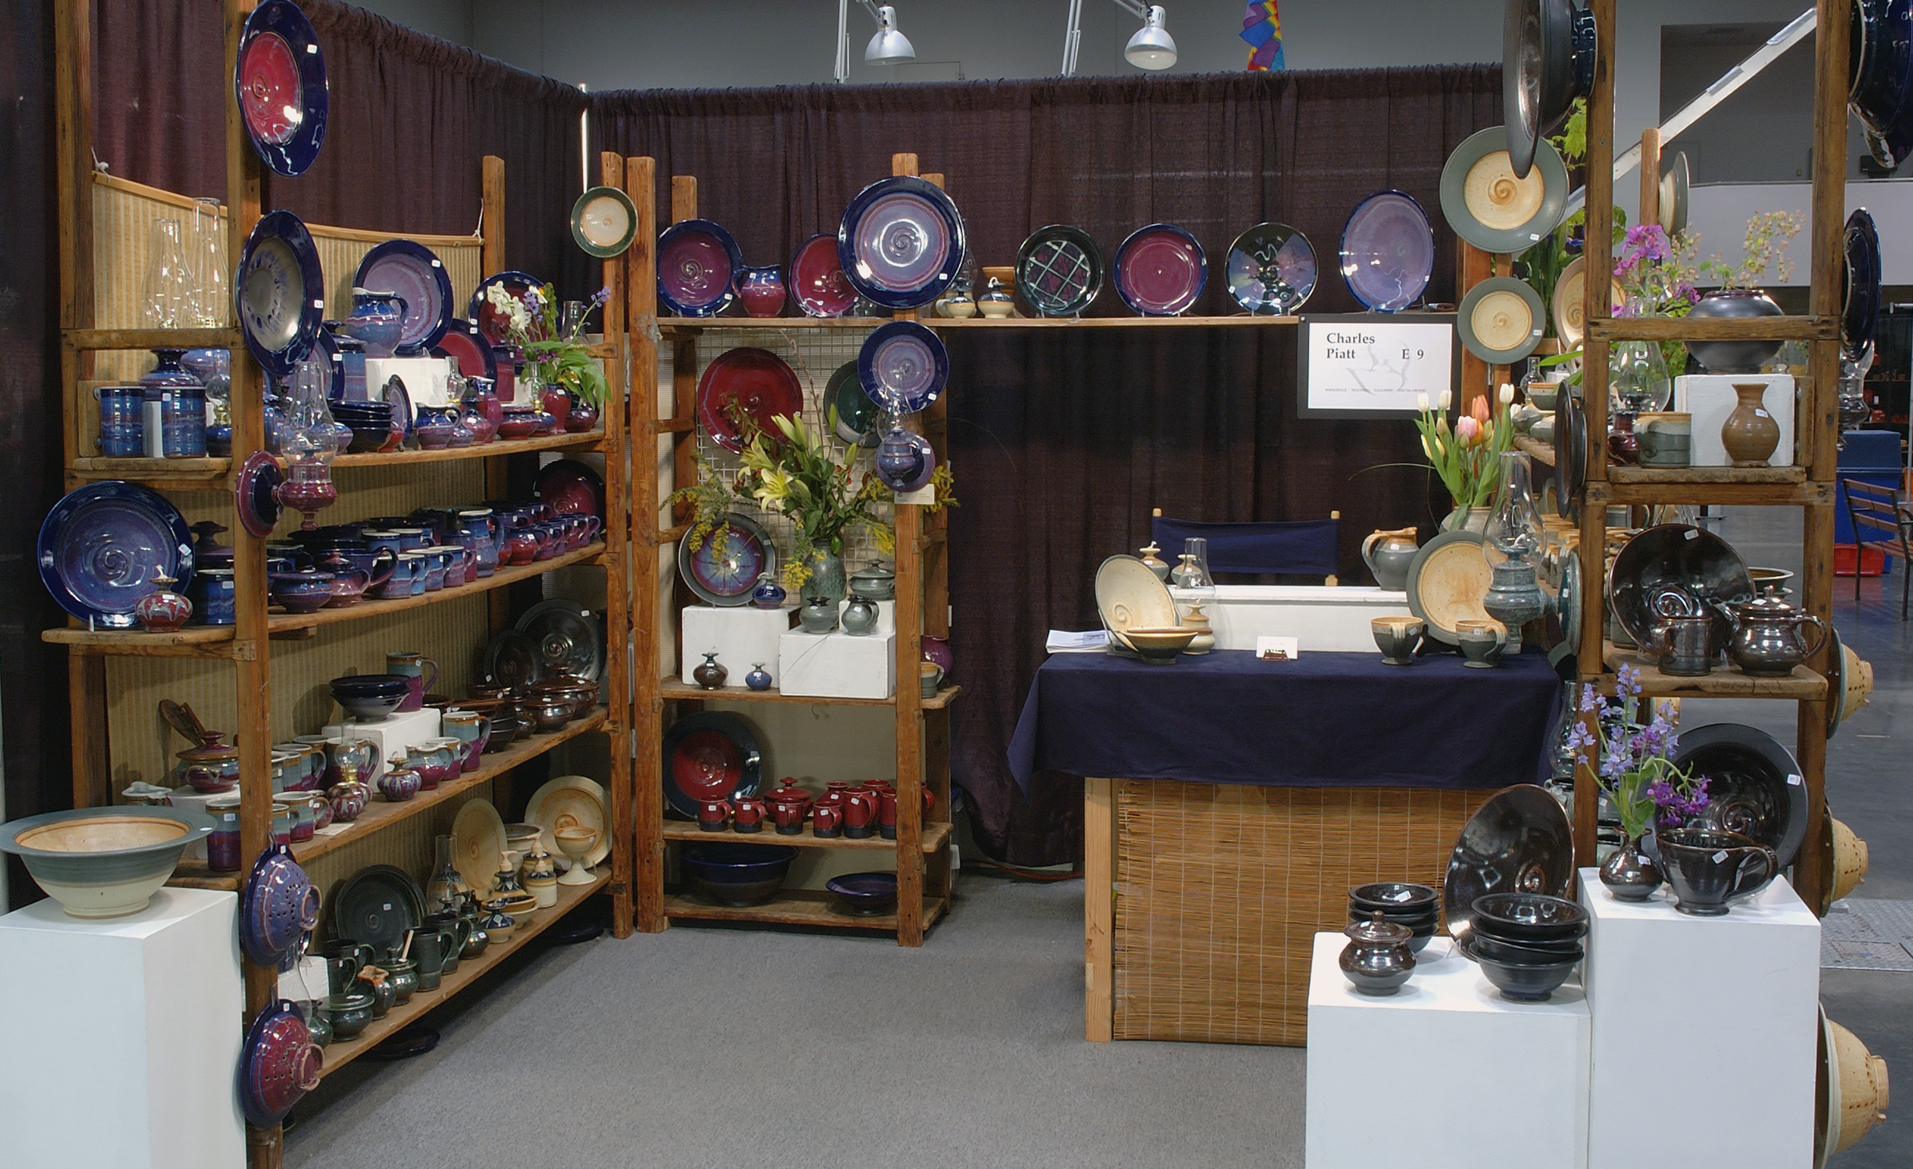 Piatt pottery pacific northwest pottery by charles piatt for Holiday craft fairs portland oregon